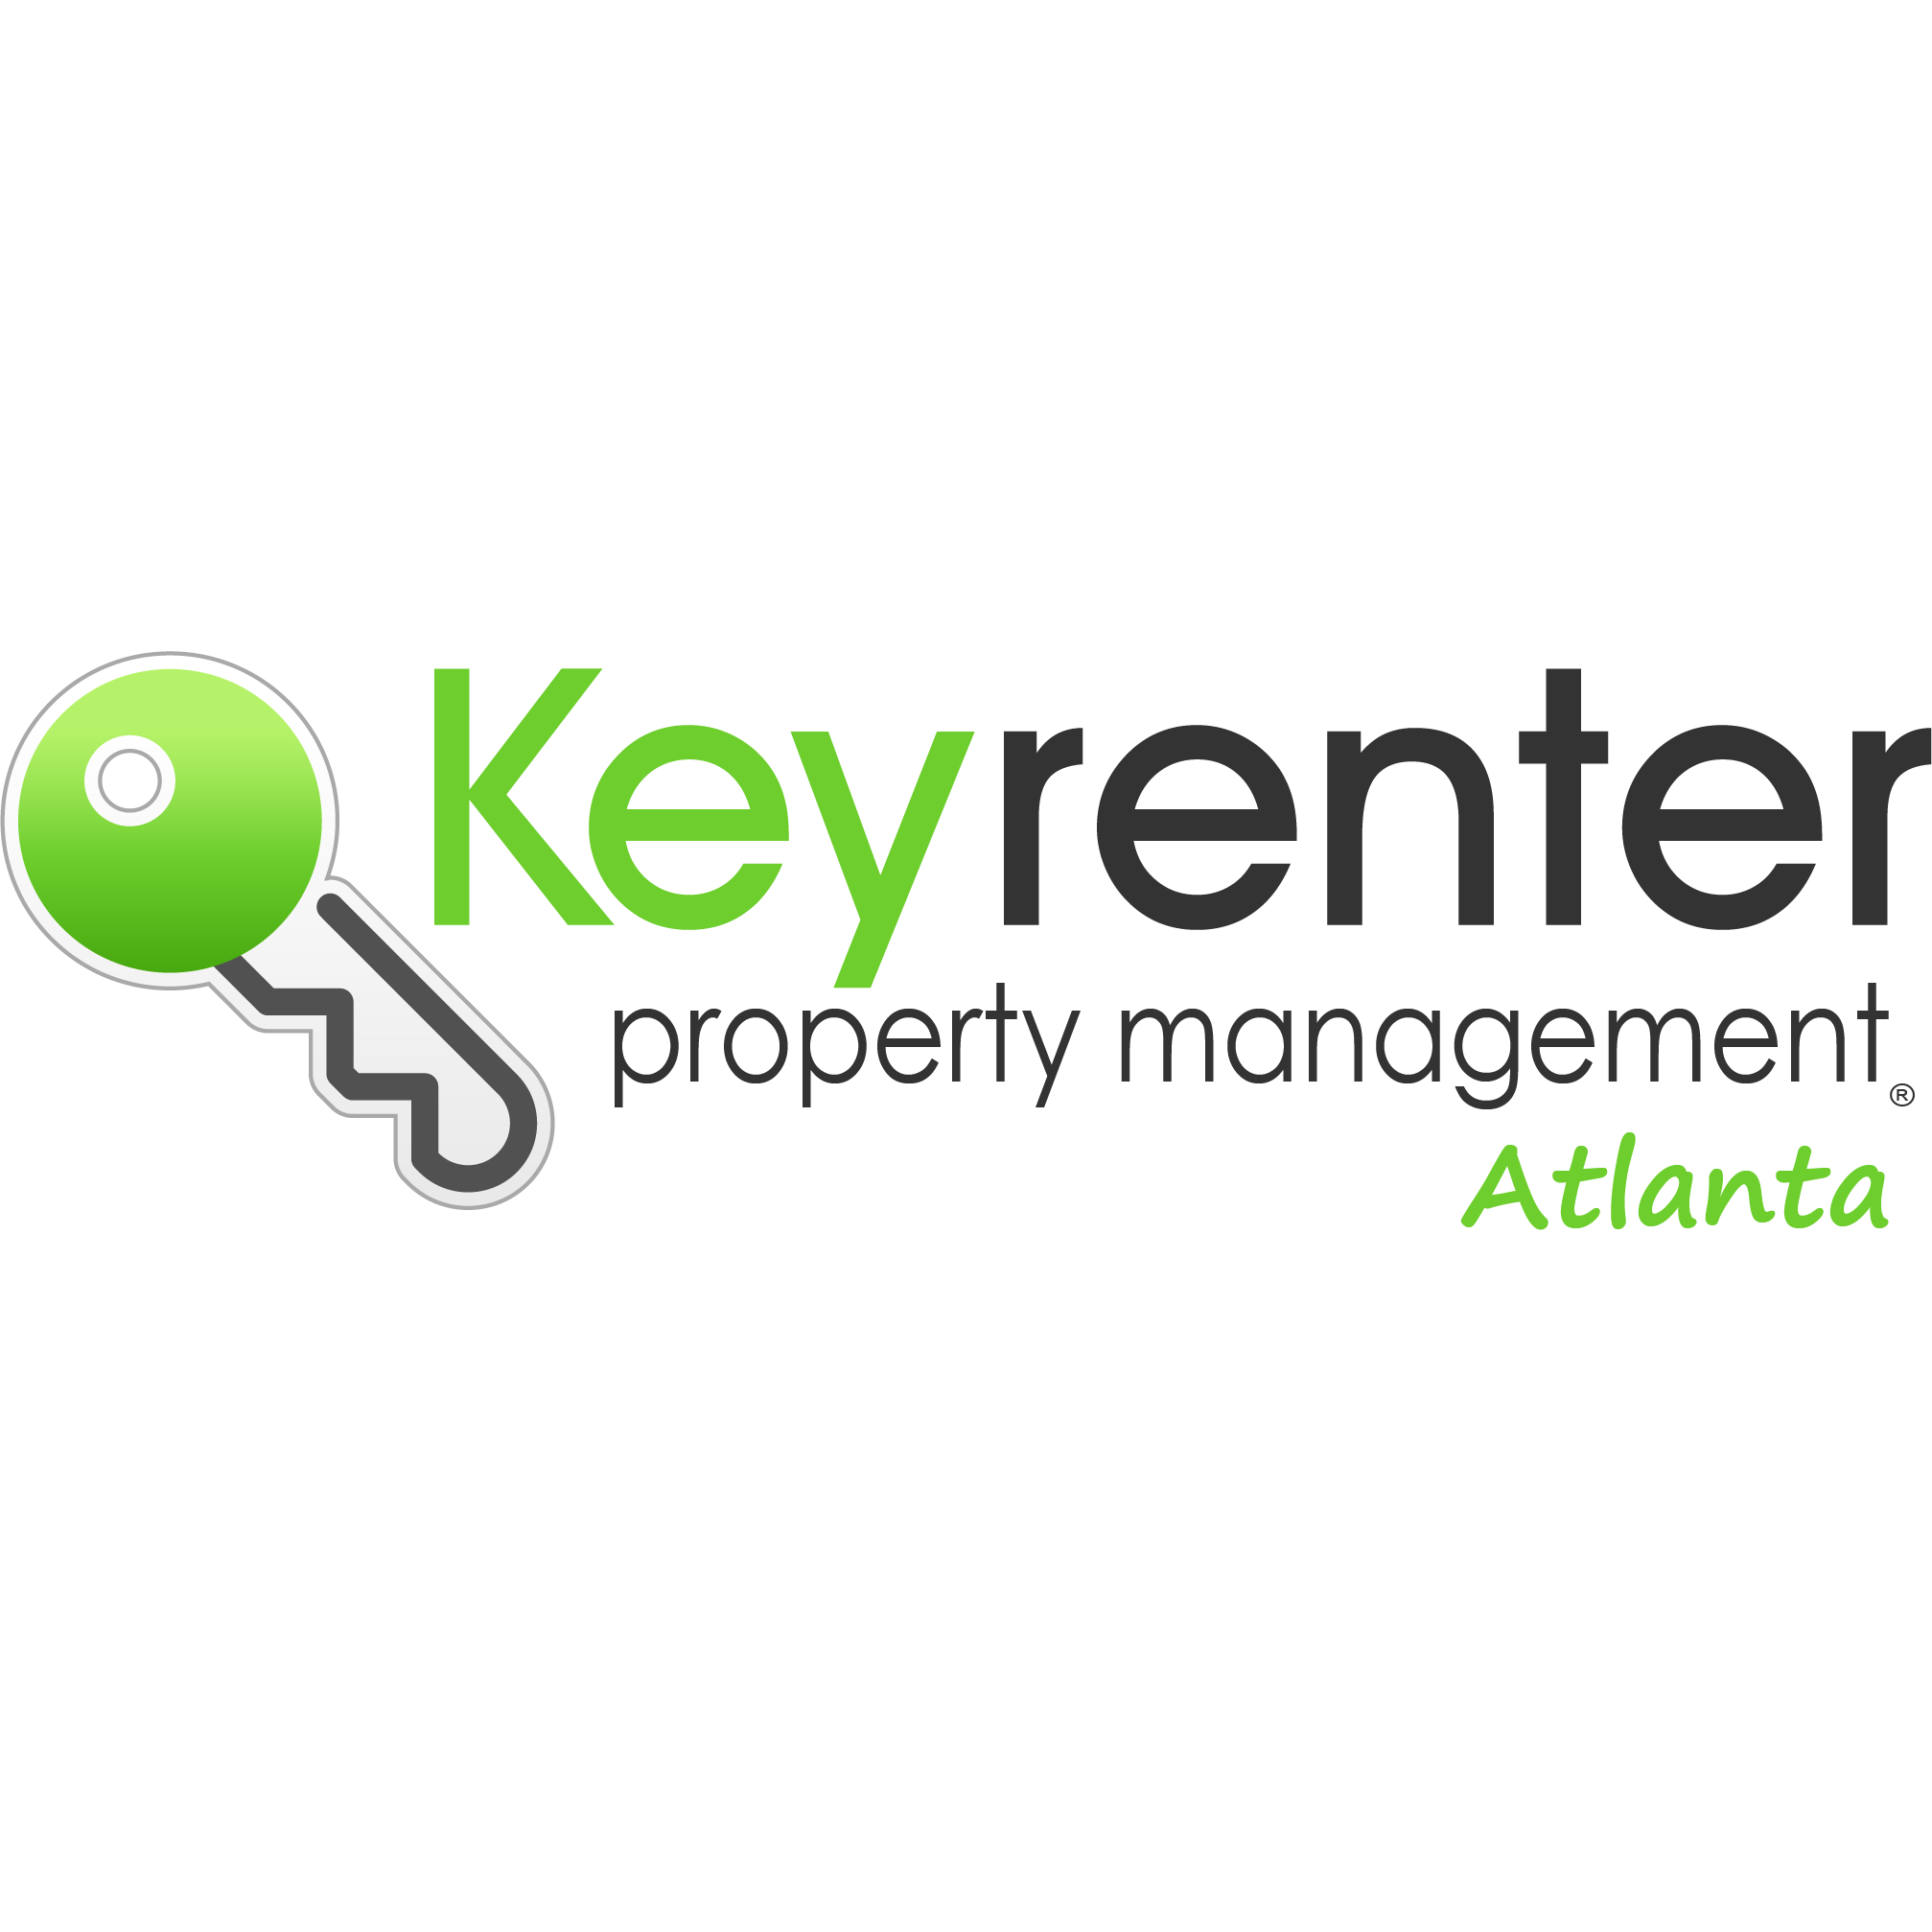 Keyrenter Property Management Atlanta